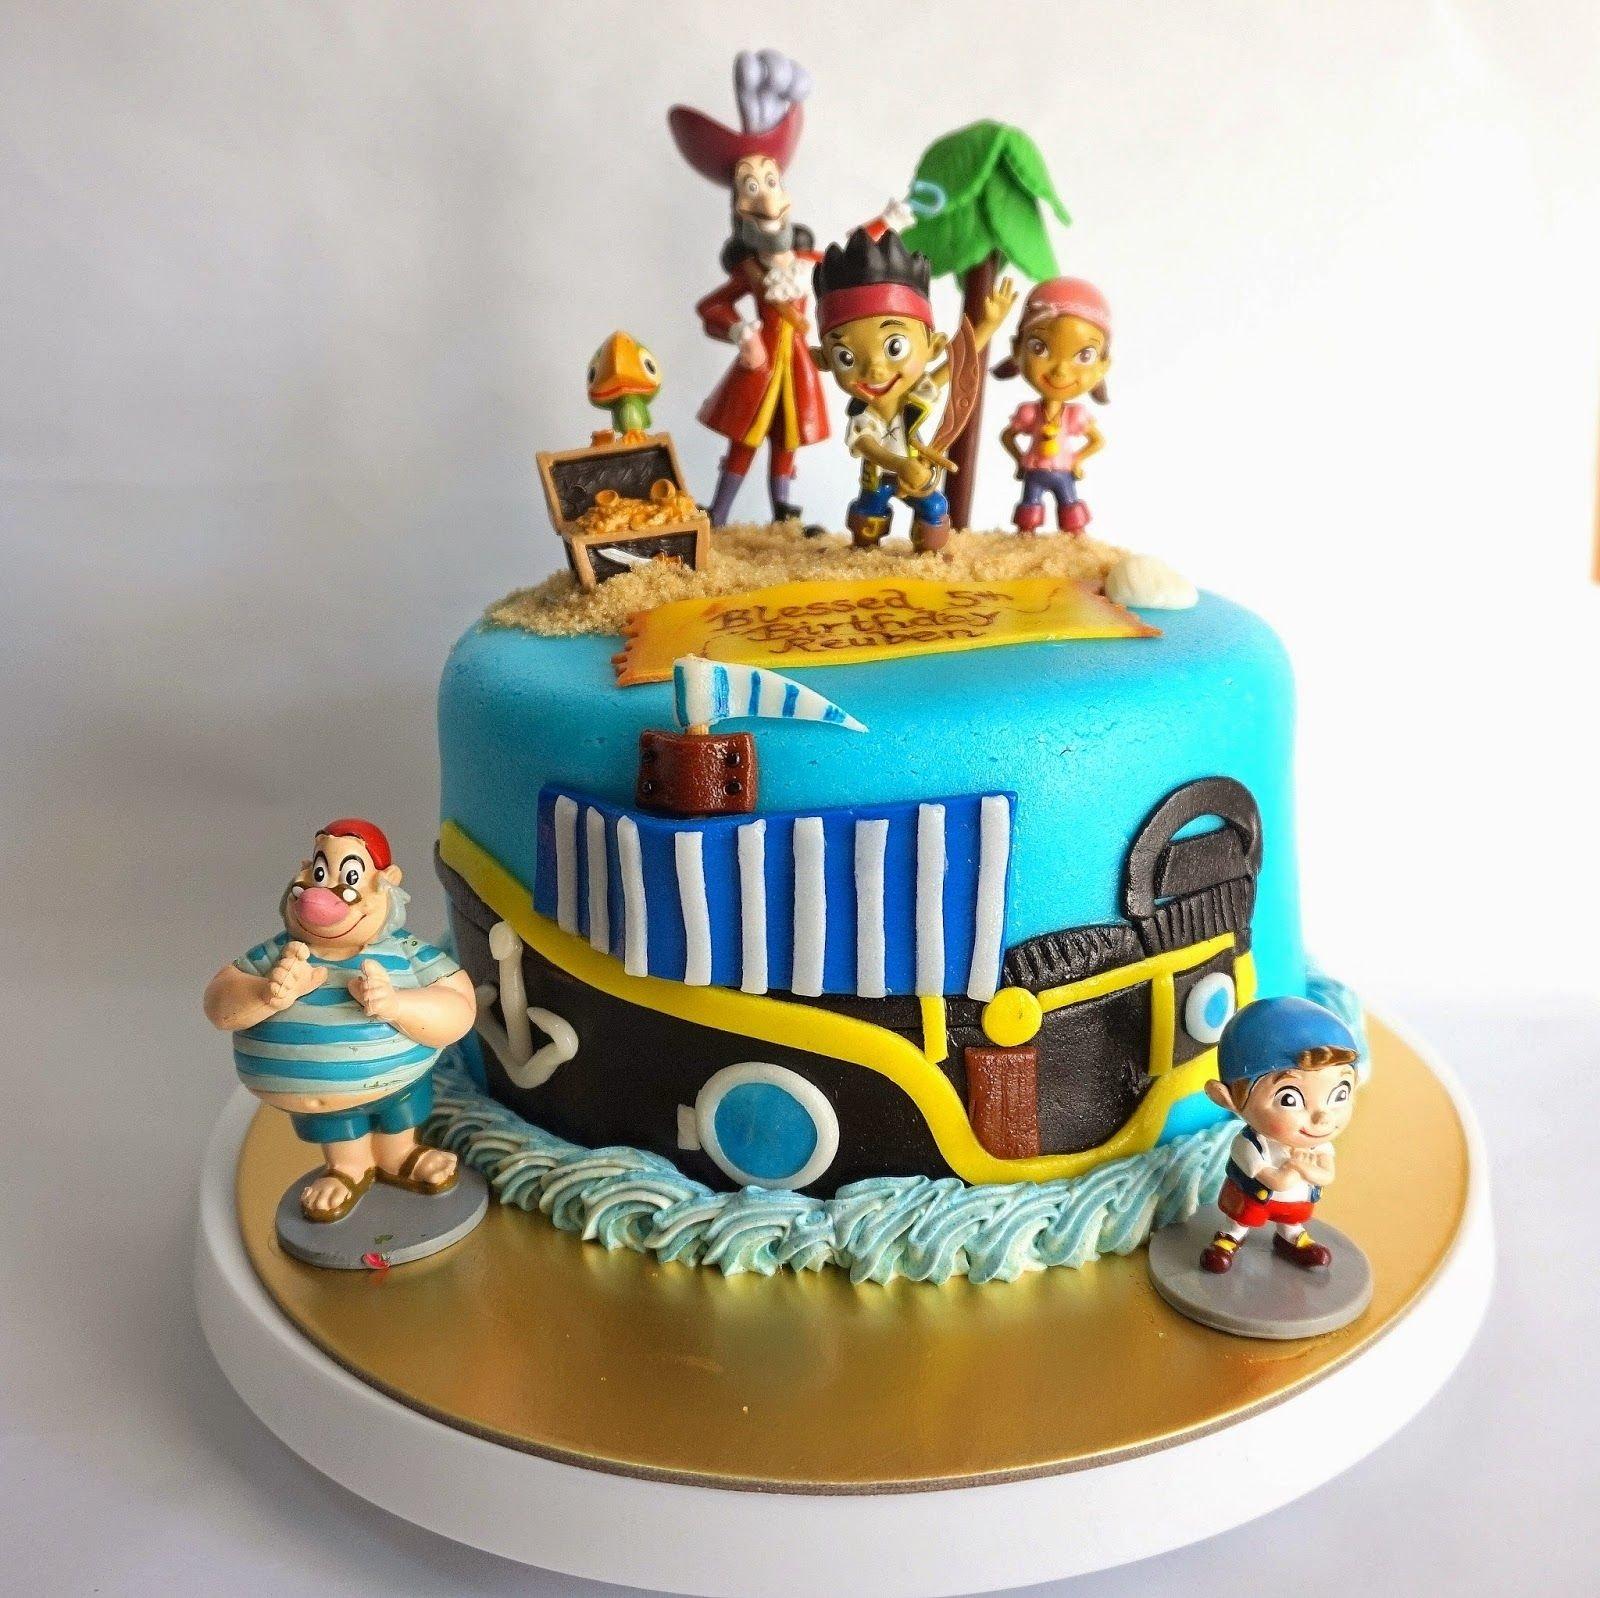 10 Nice Jake And The Neverland Pirate Cake Ideas jack and the neverland pirates themed cake gouter juin et gateau 2020